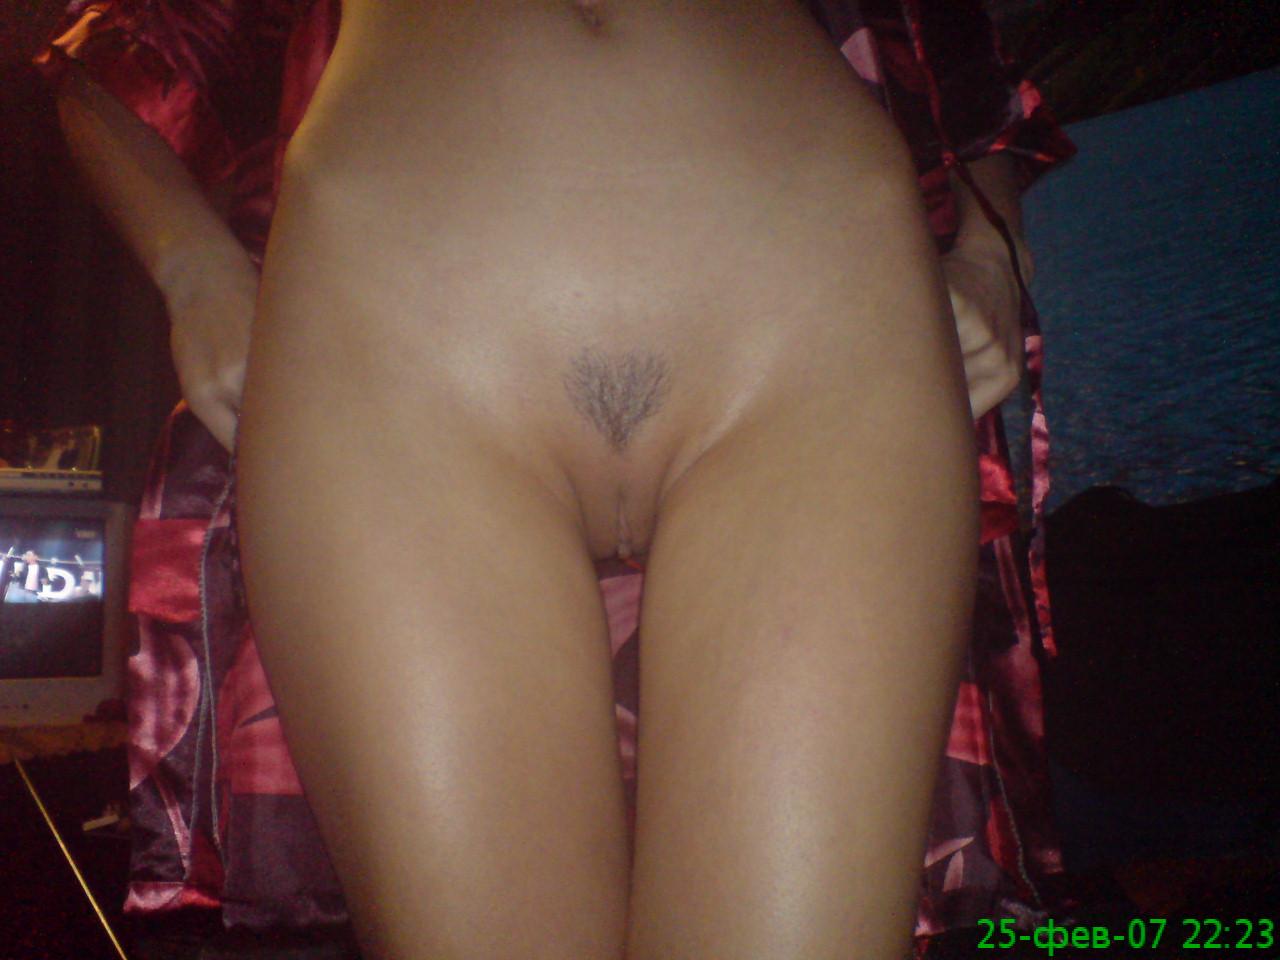 lichnoe-seks-porno-doma-goloe-foto-znamenitostey-foto